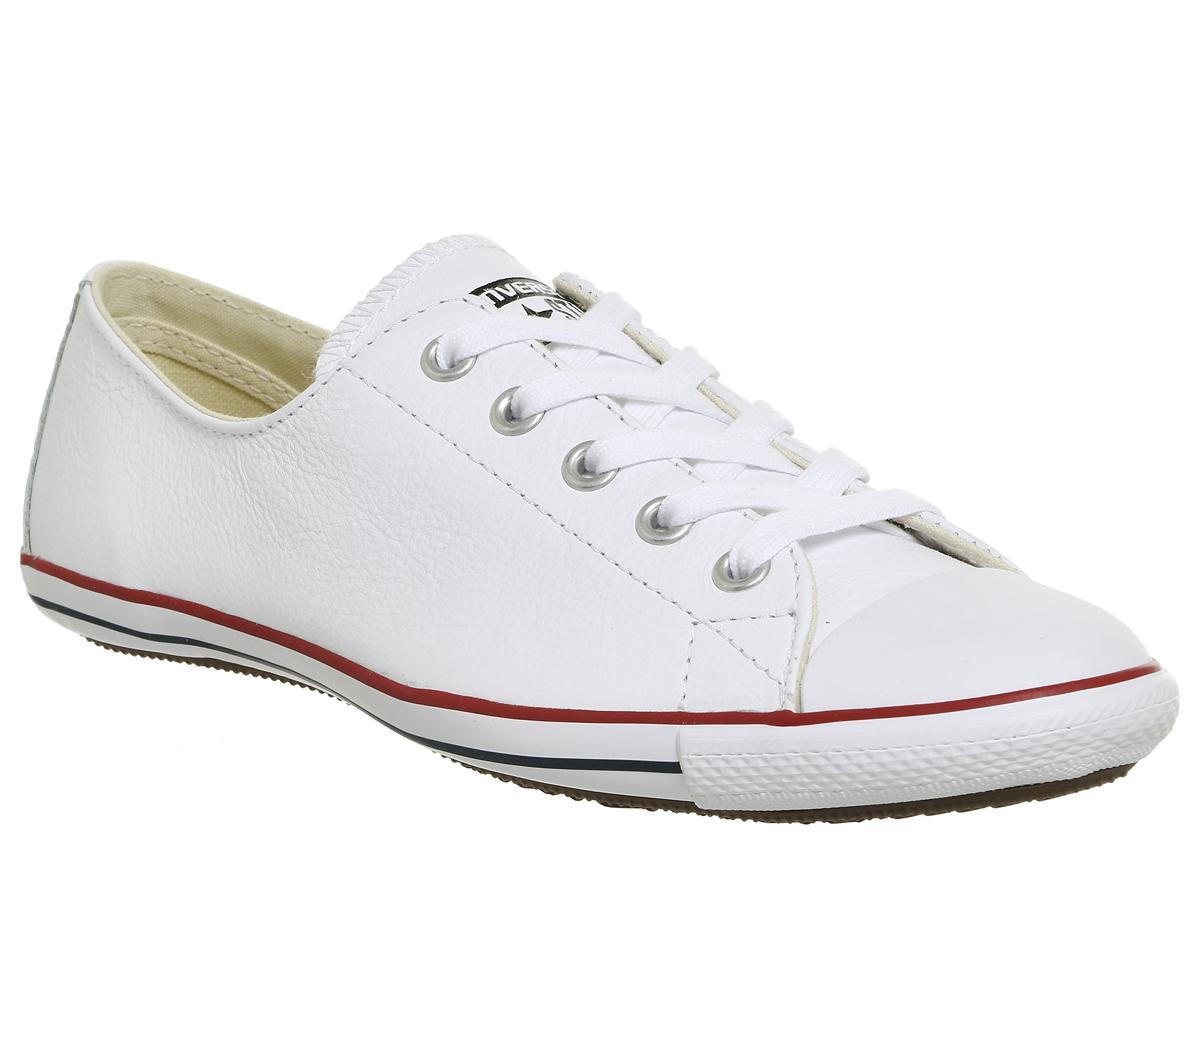 Converse Ct Lite 2 White Garnet Leather